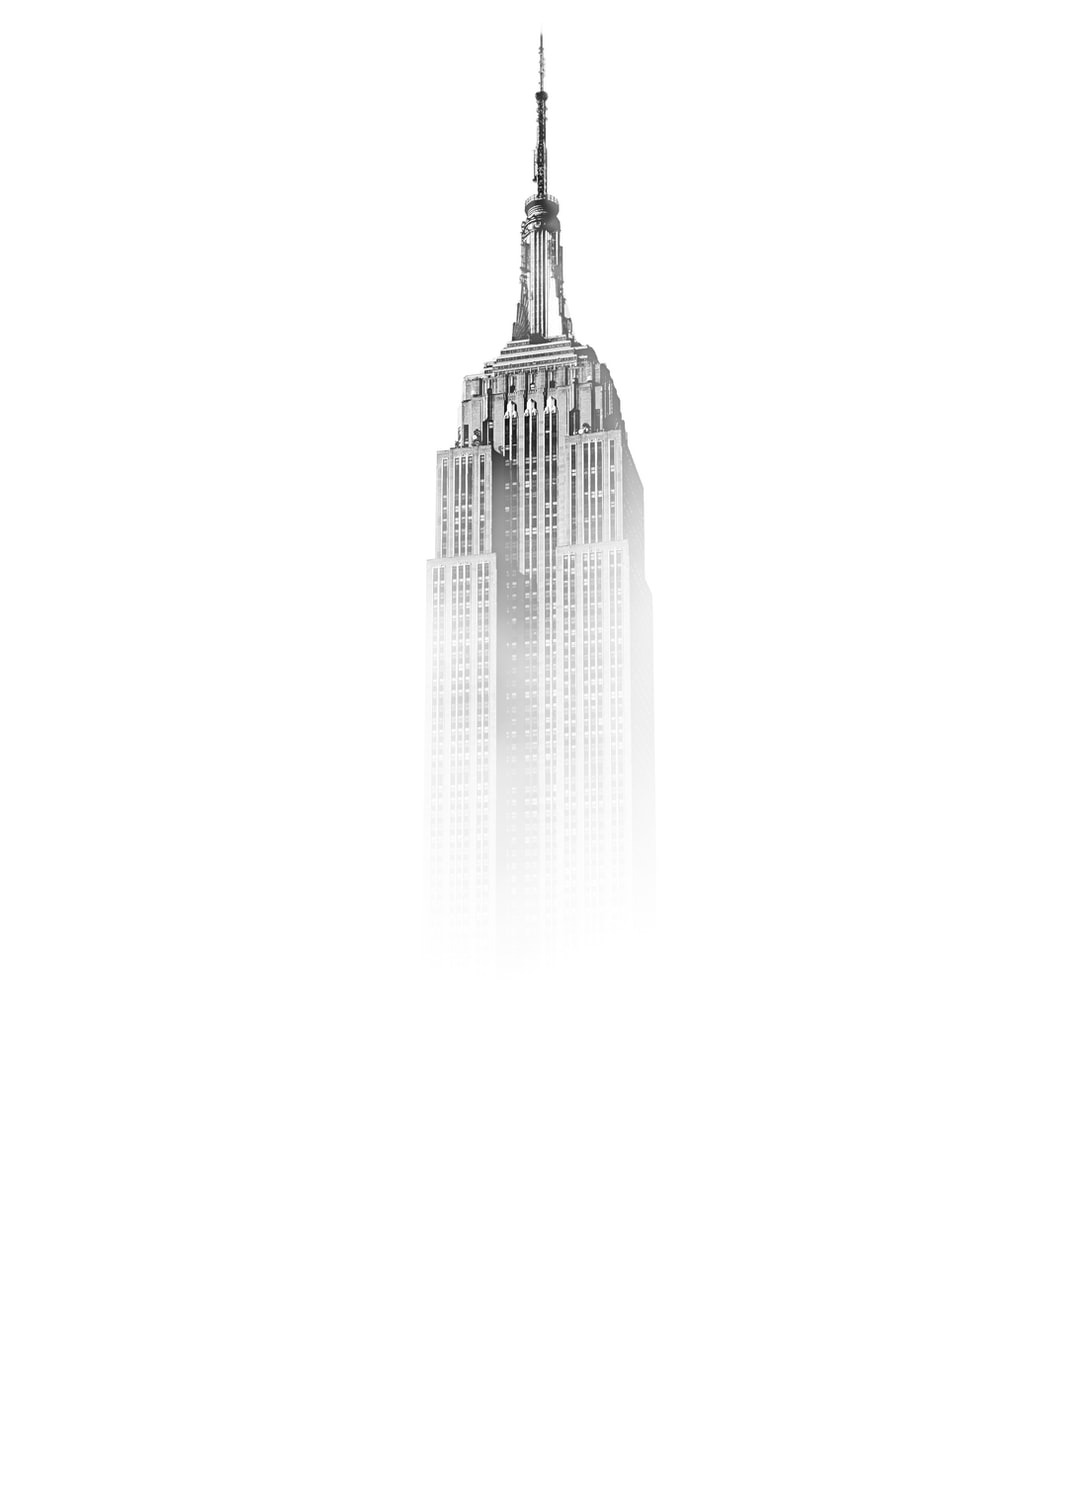 Minimalist Iphone Pictures Download Images on Unsplash 1080x1512